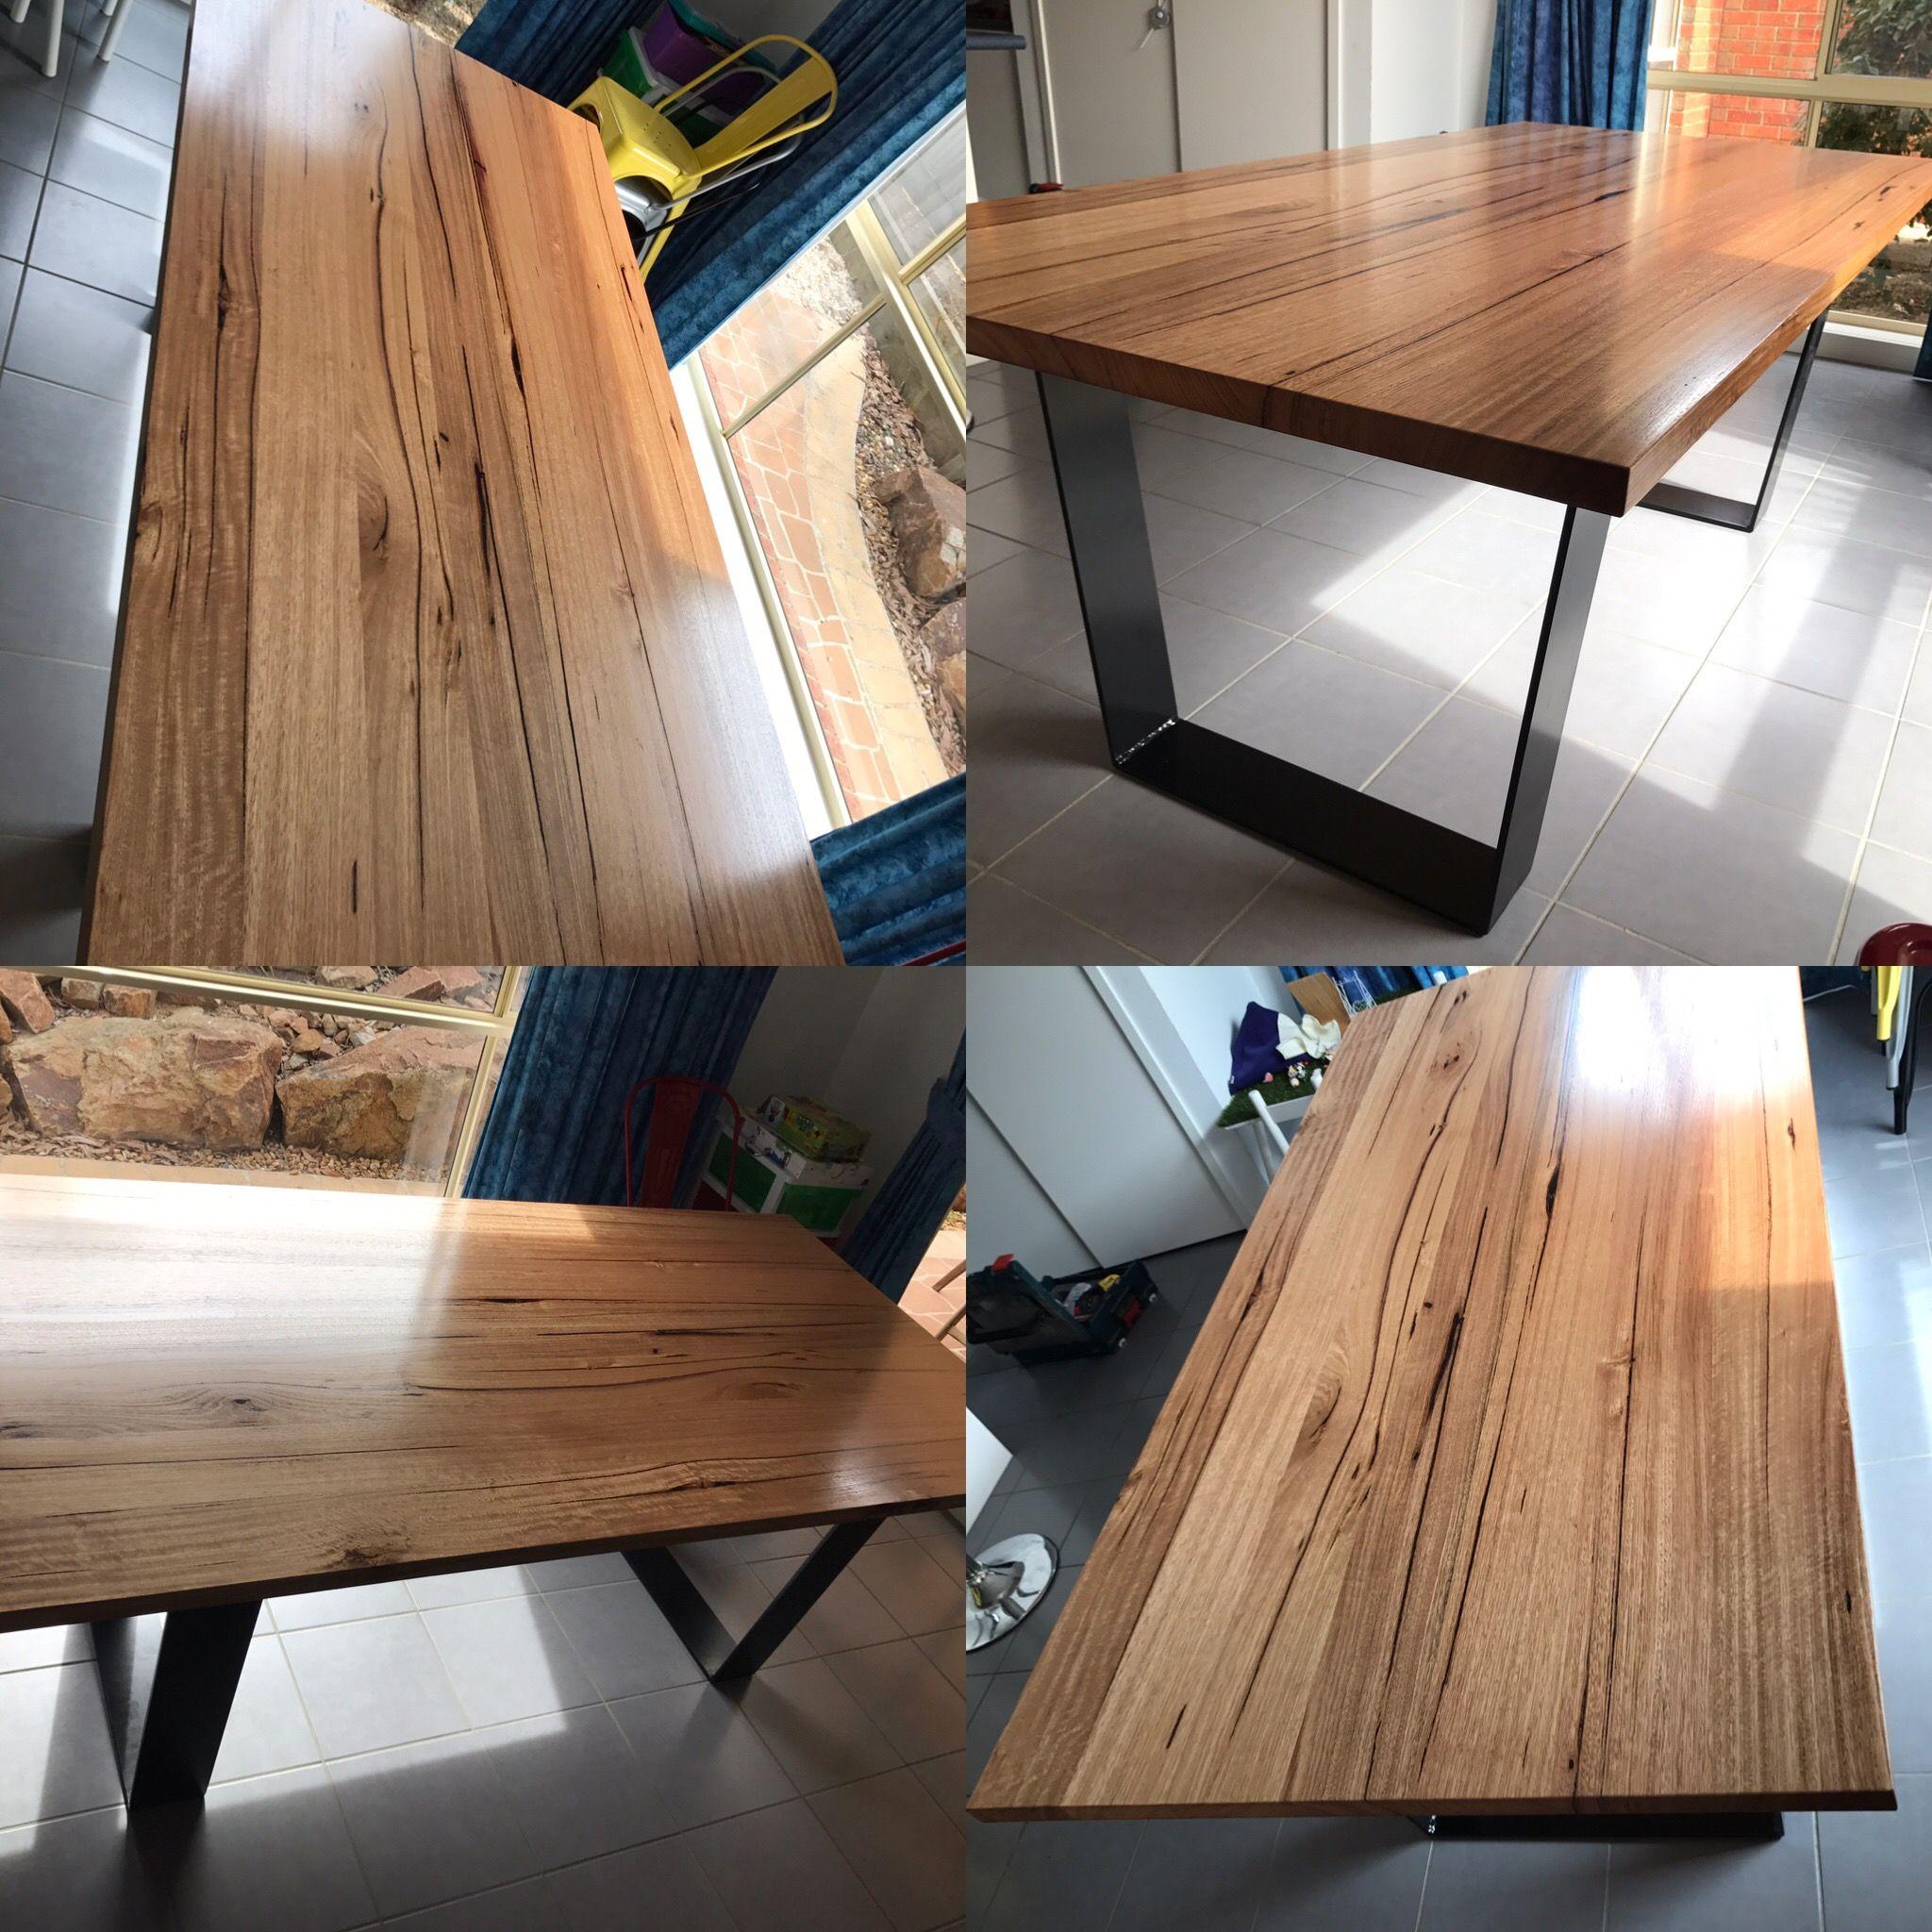 Custom made hardwood furniture recycled messmate vic ash tas oak dining tables gumtree australia mornington peninsula baxter 11521